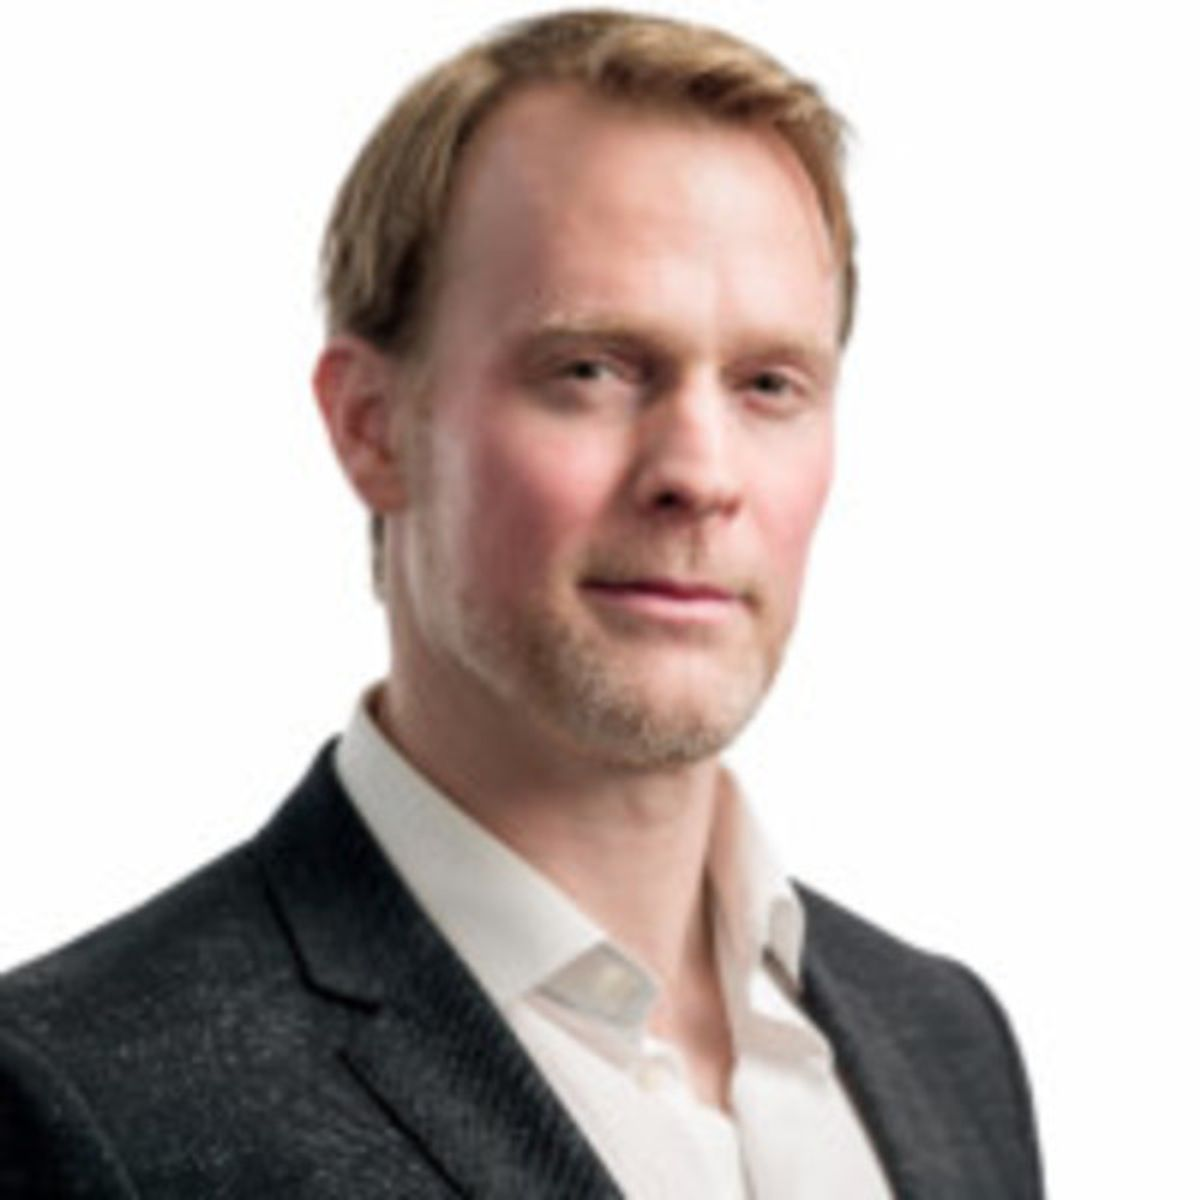 Photo of Dan  Friedland, Managing Director at Goldcrest Capital